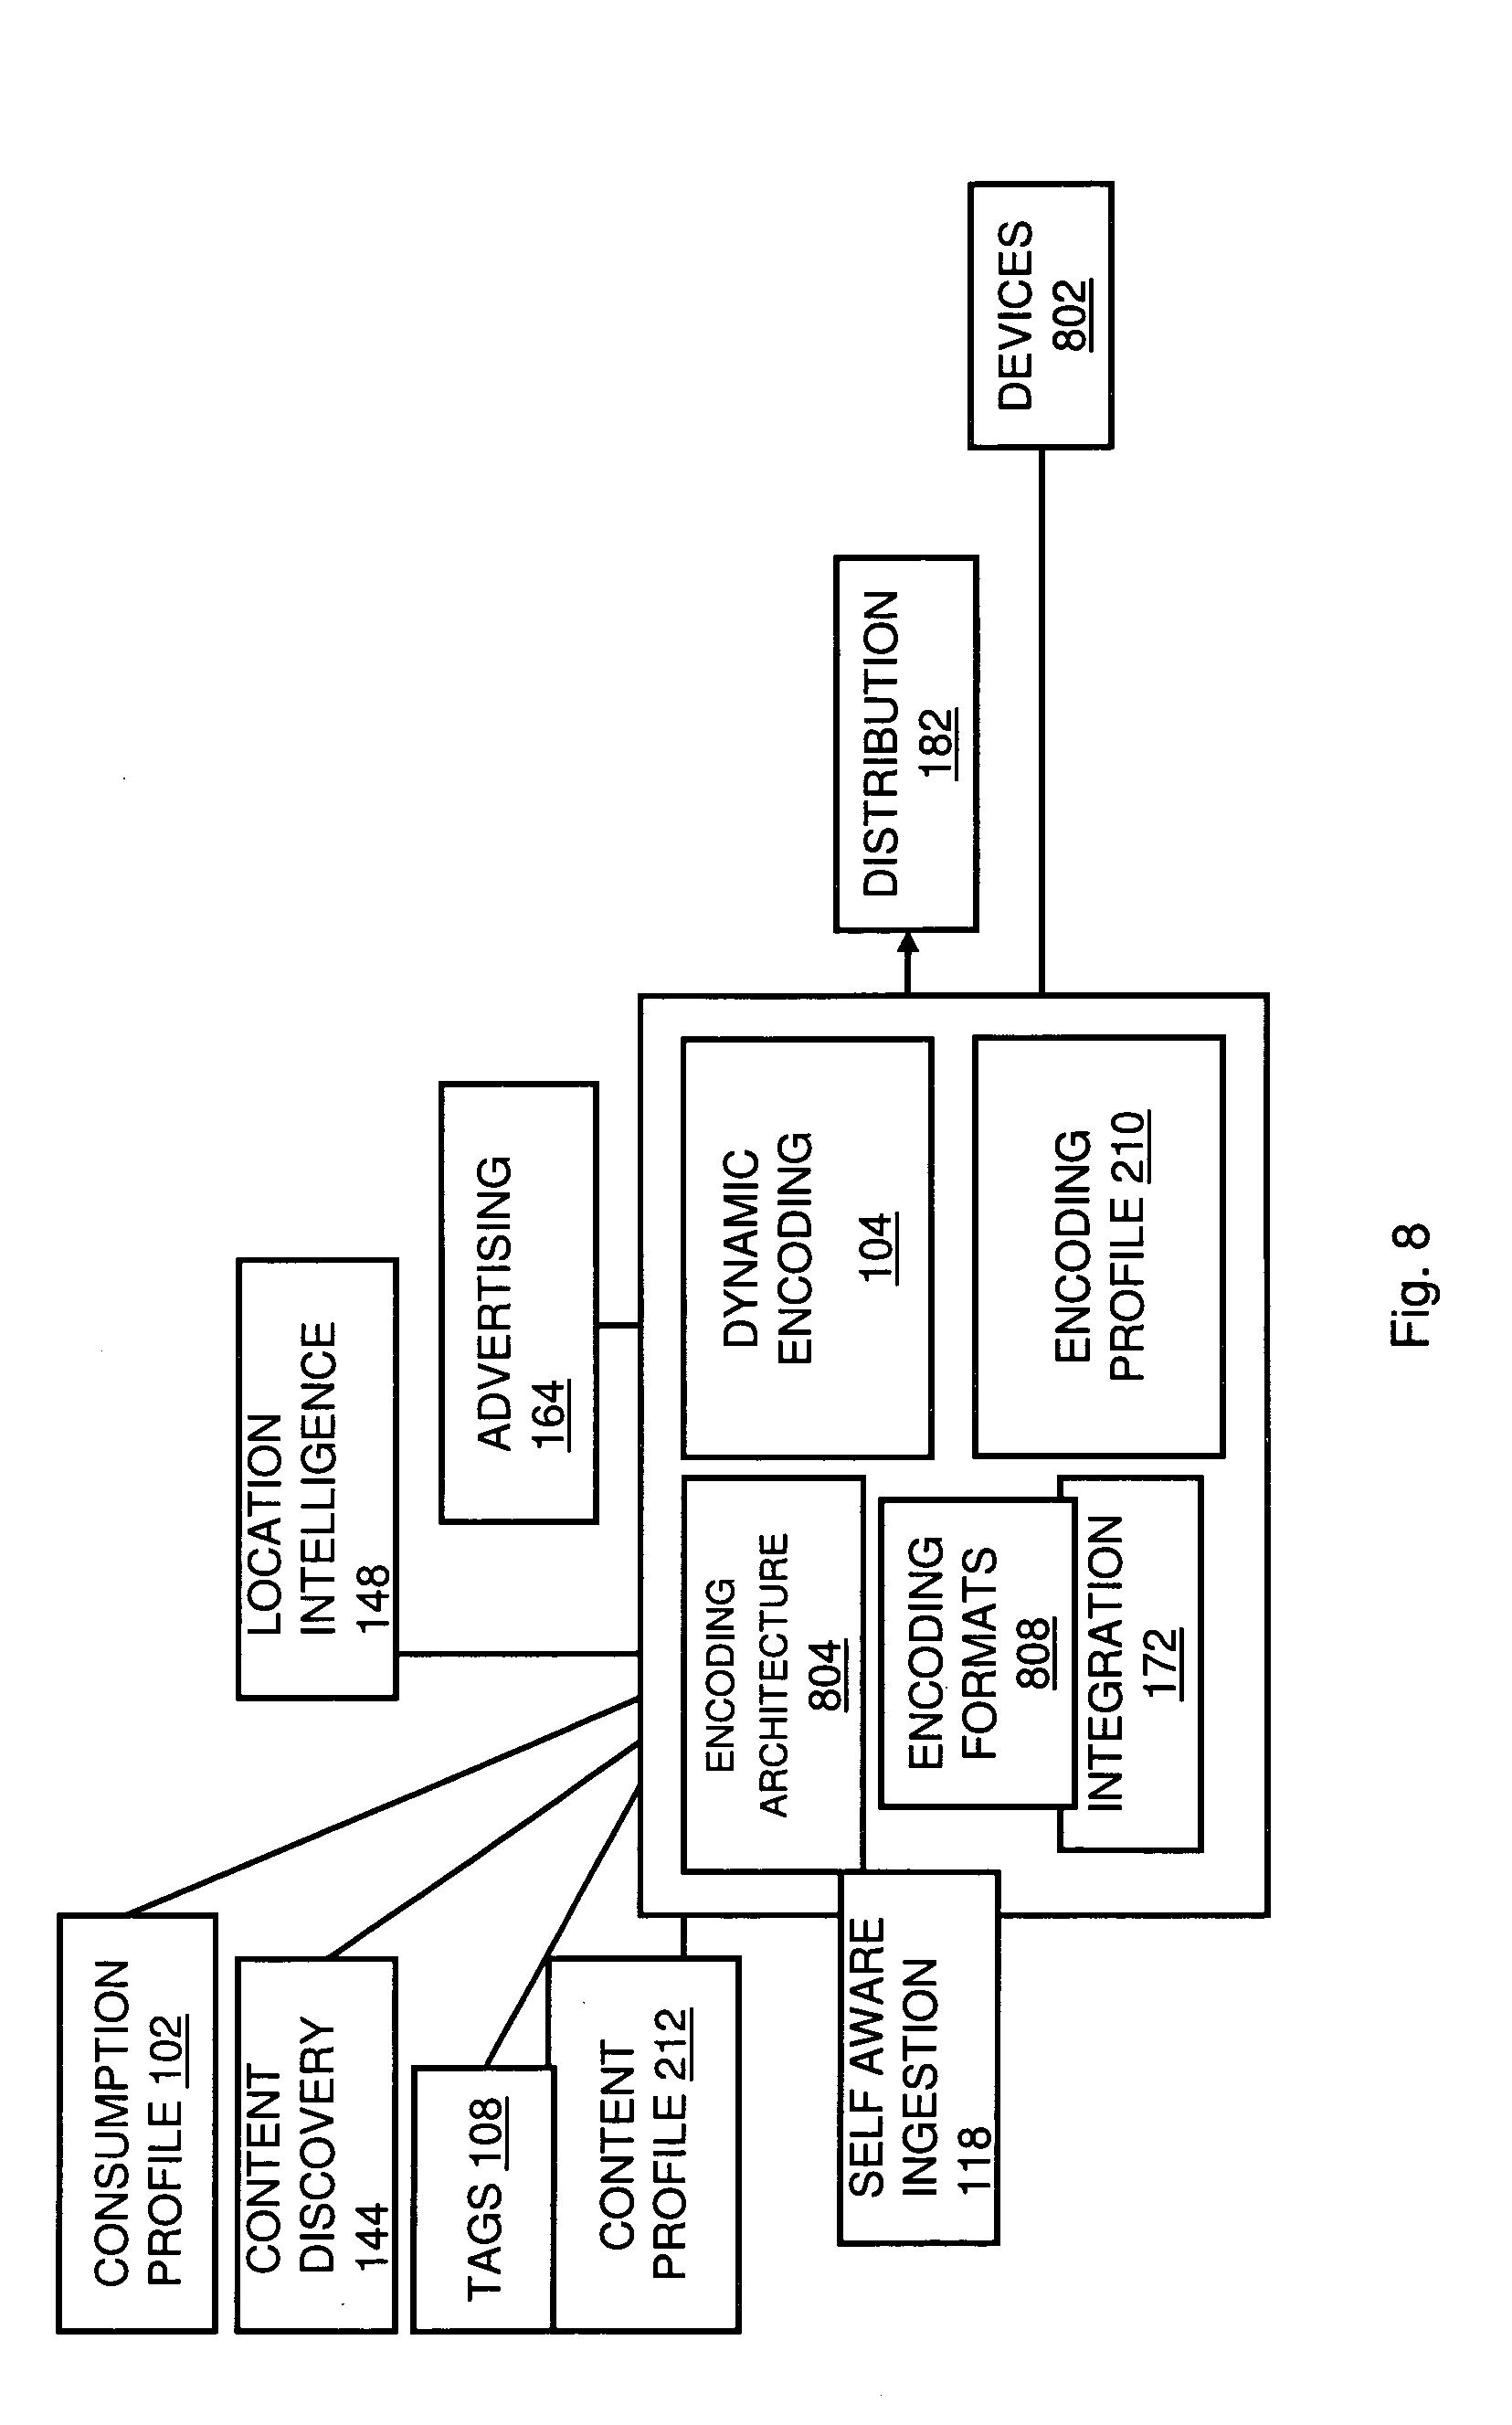 Patent US 20080195664A1